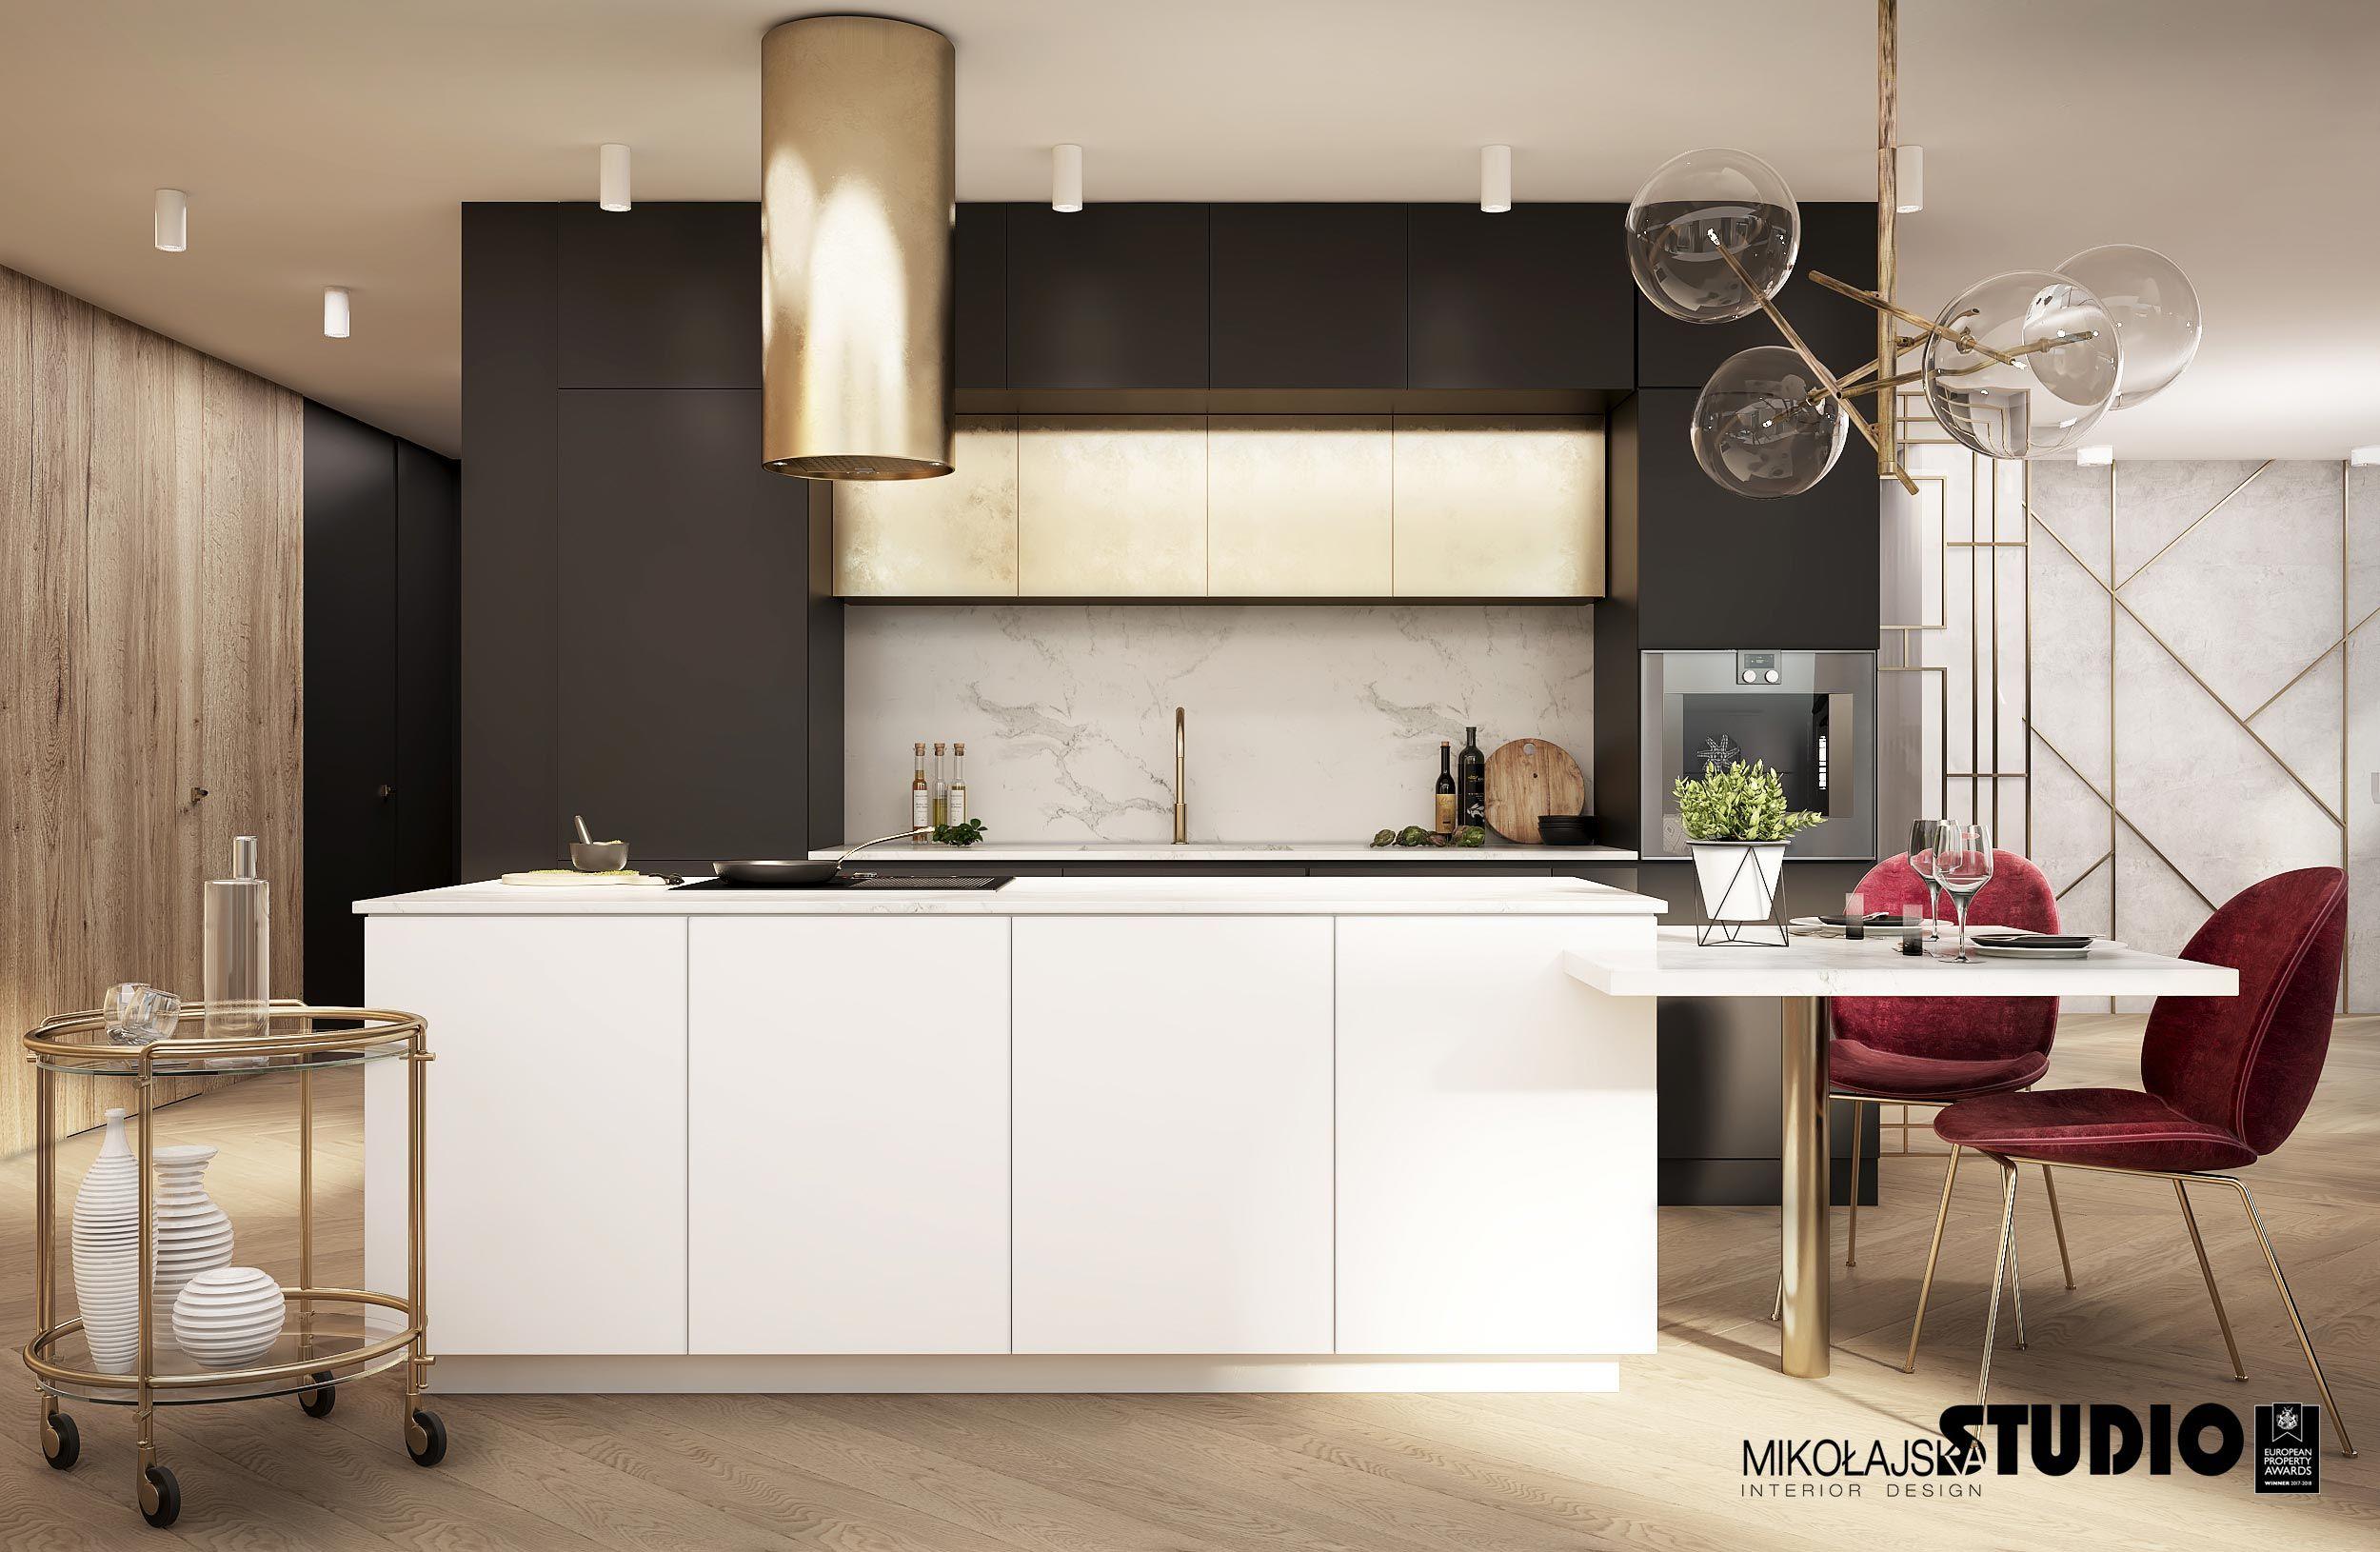 Zloty Okap Biale Fronty Zlote Szafki Elegant Kitchens Home Decor Kitchen